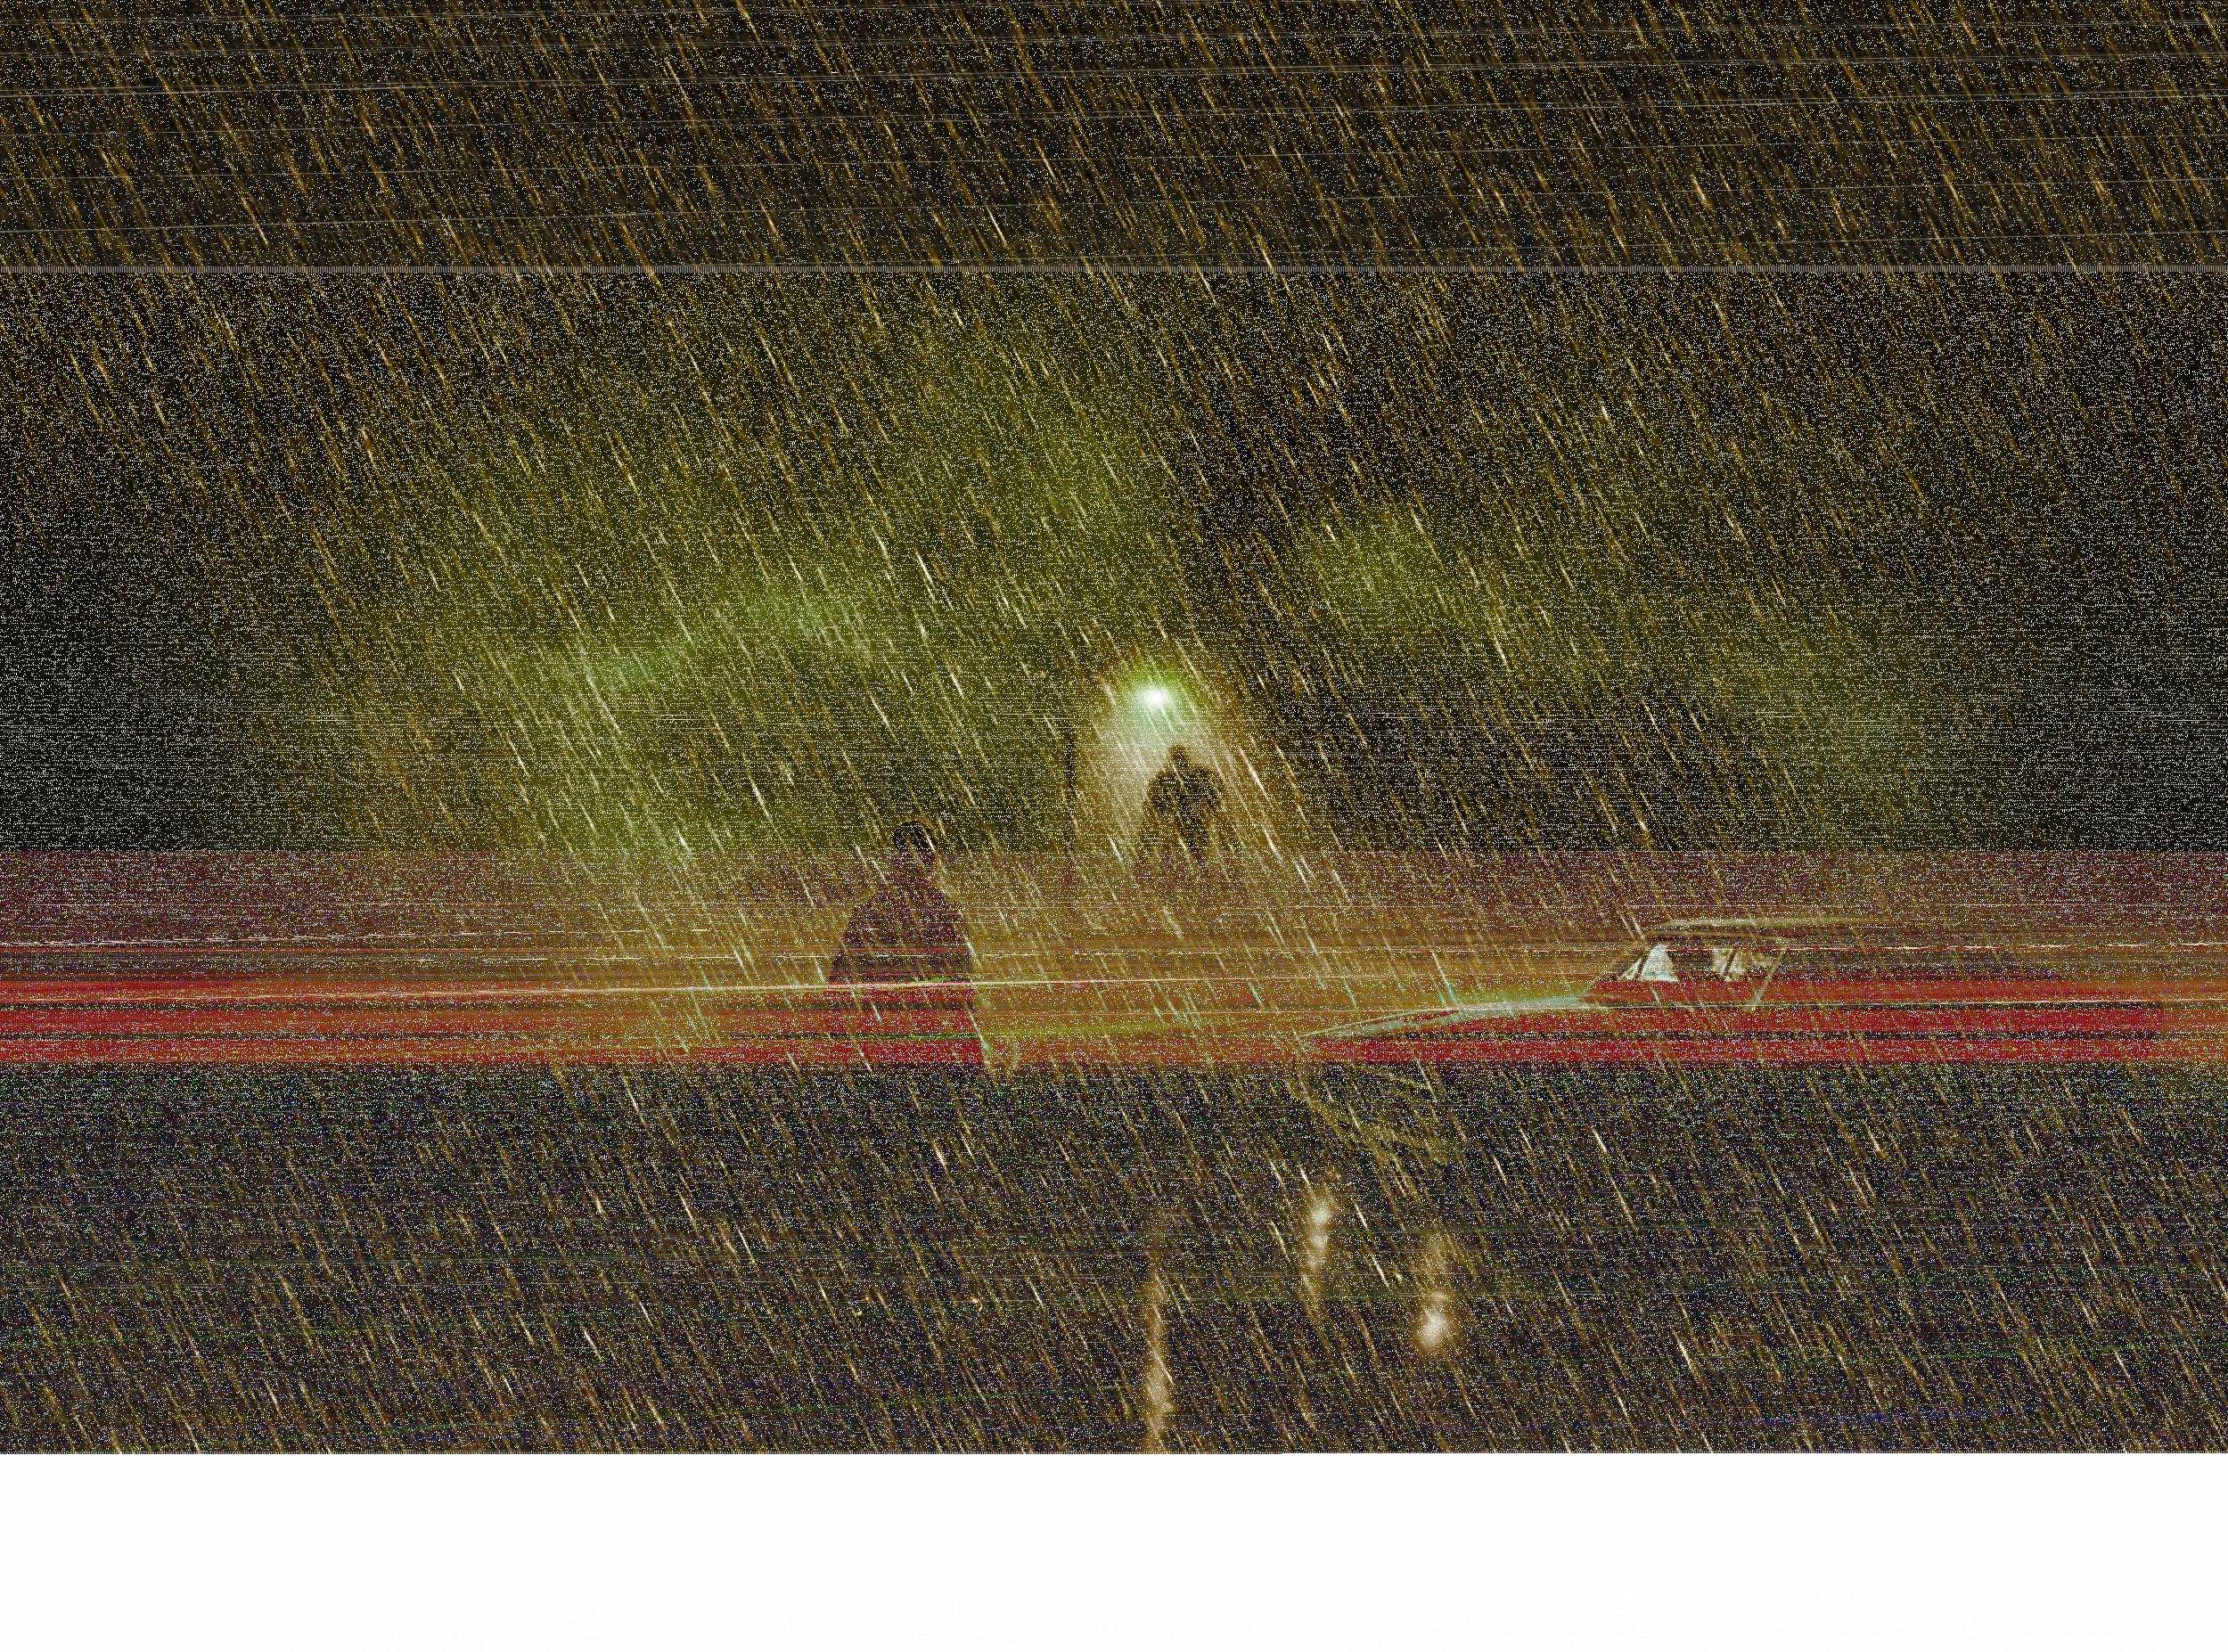 Illustration/Concept Art for horror-thriller feature film